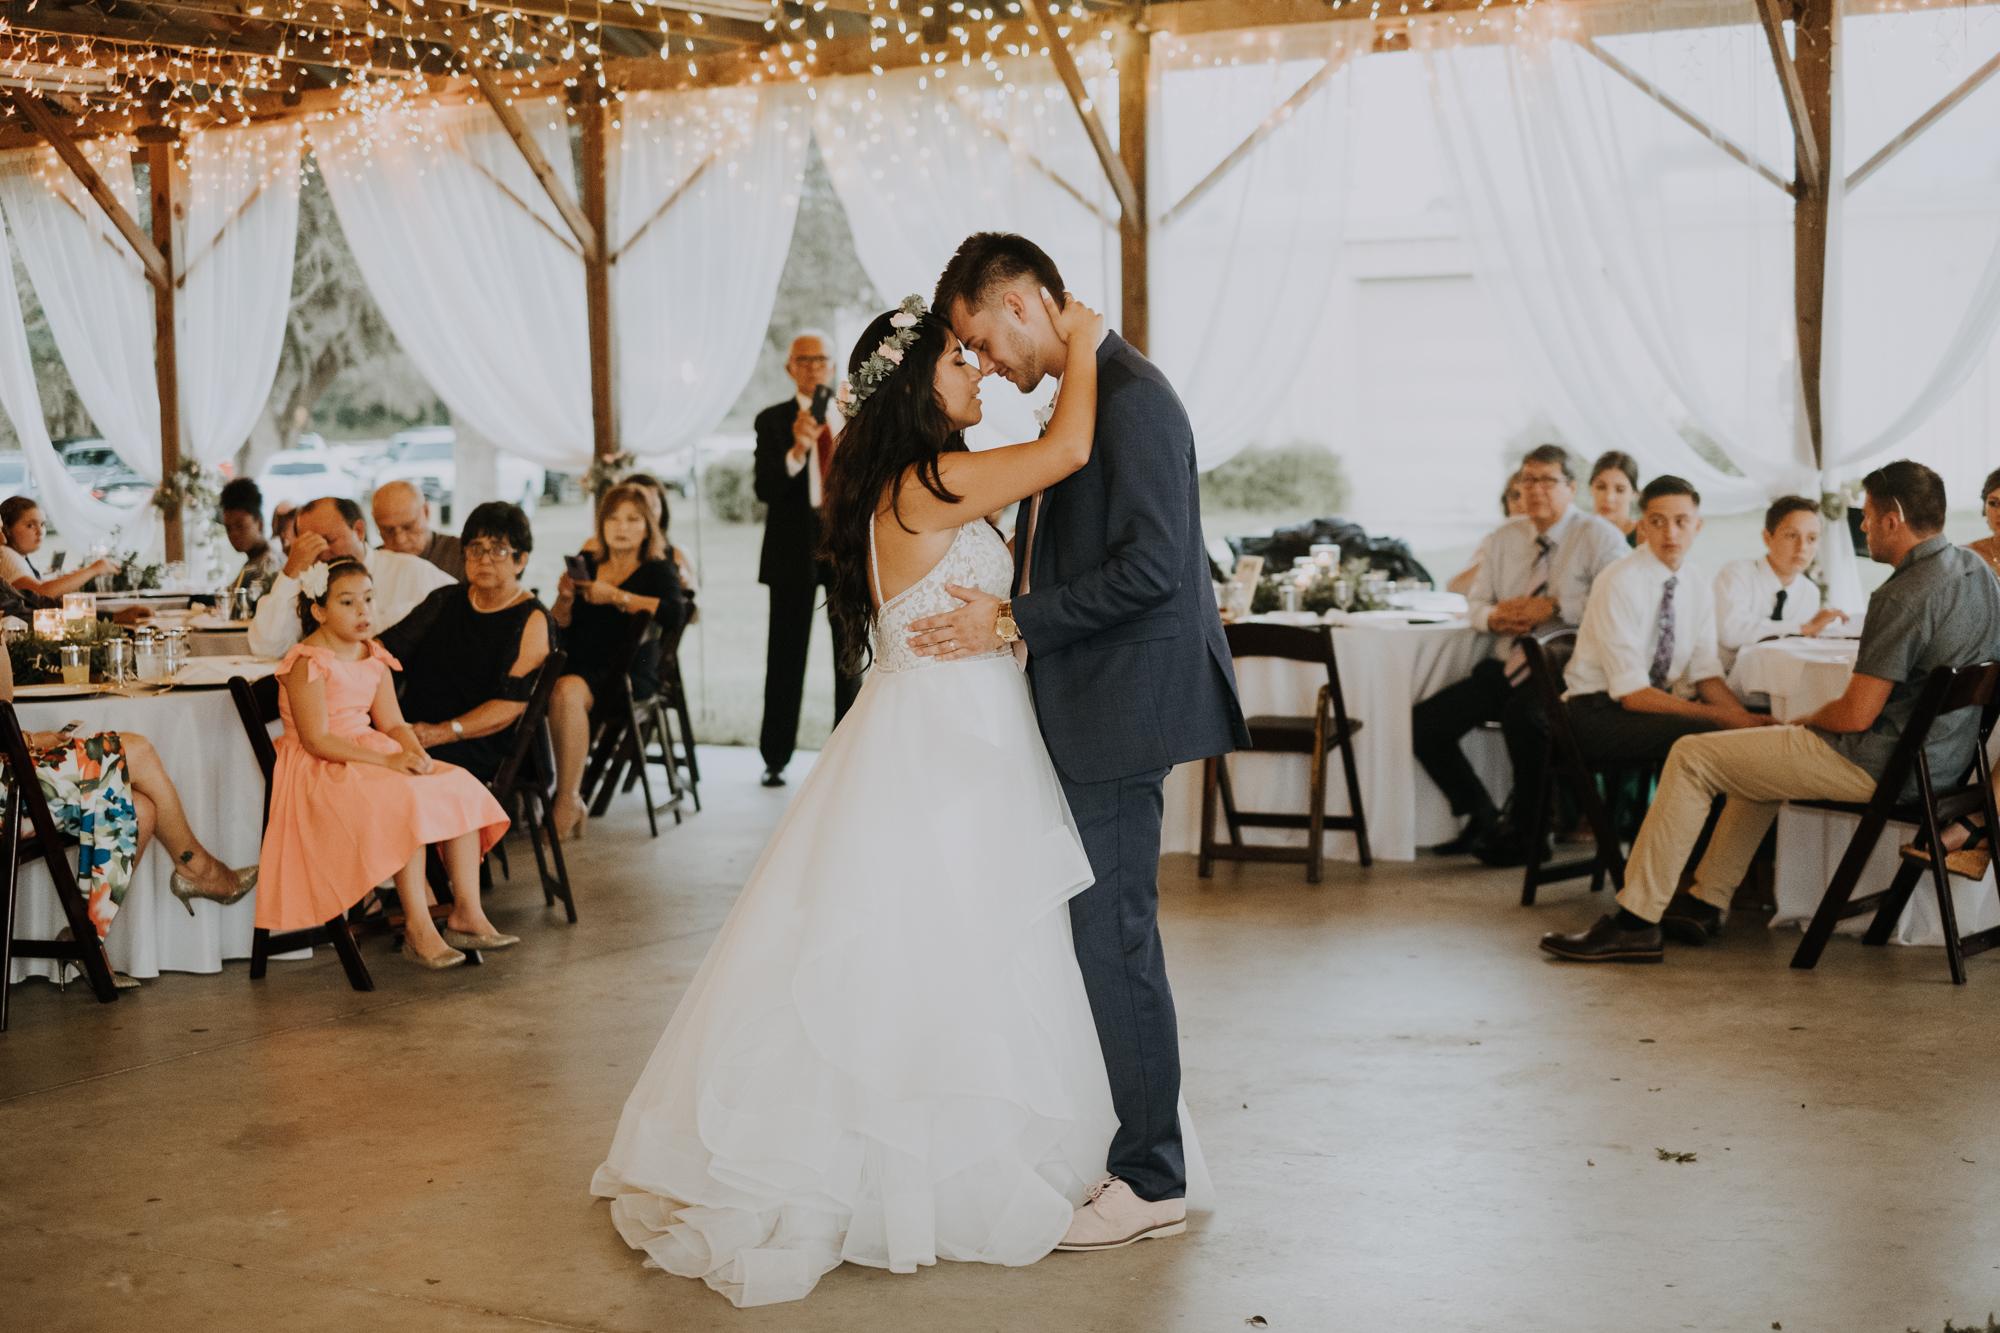 husband and wife first dance | wedding first dance | first dance as husband and wife | boho wedding reception | romantic sarasota wedding